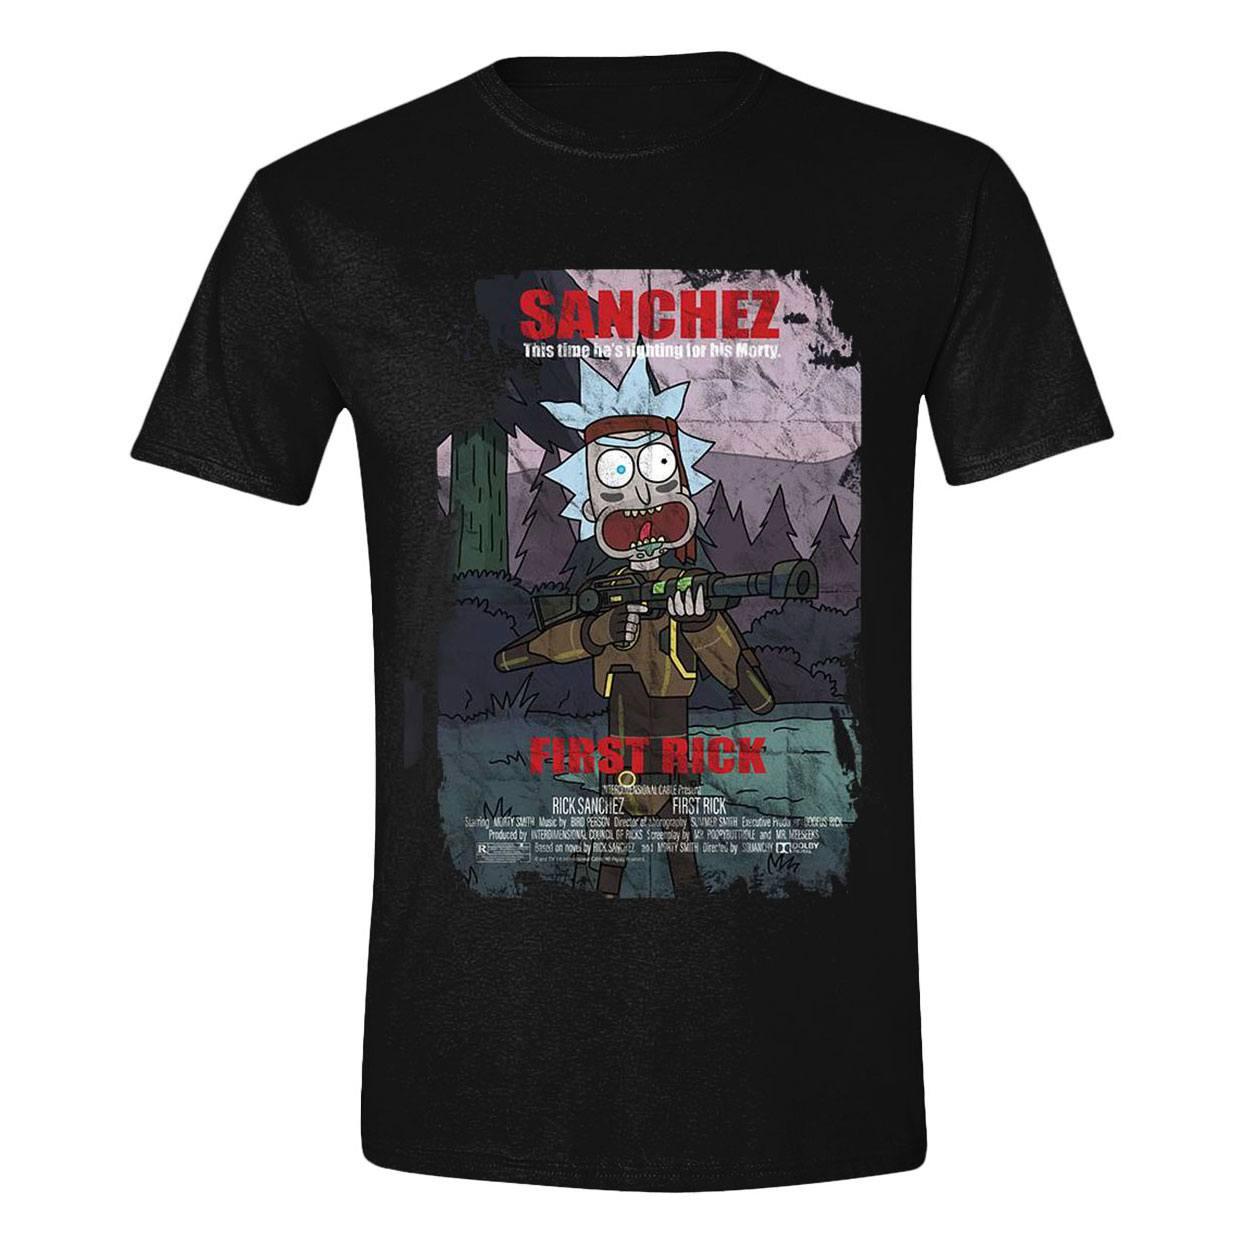 Rick & Morty T-Shirt First Rick Poster Size XL